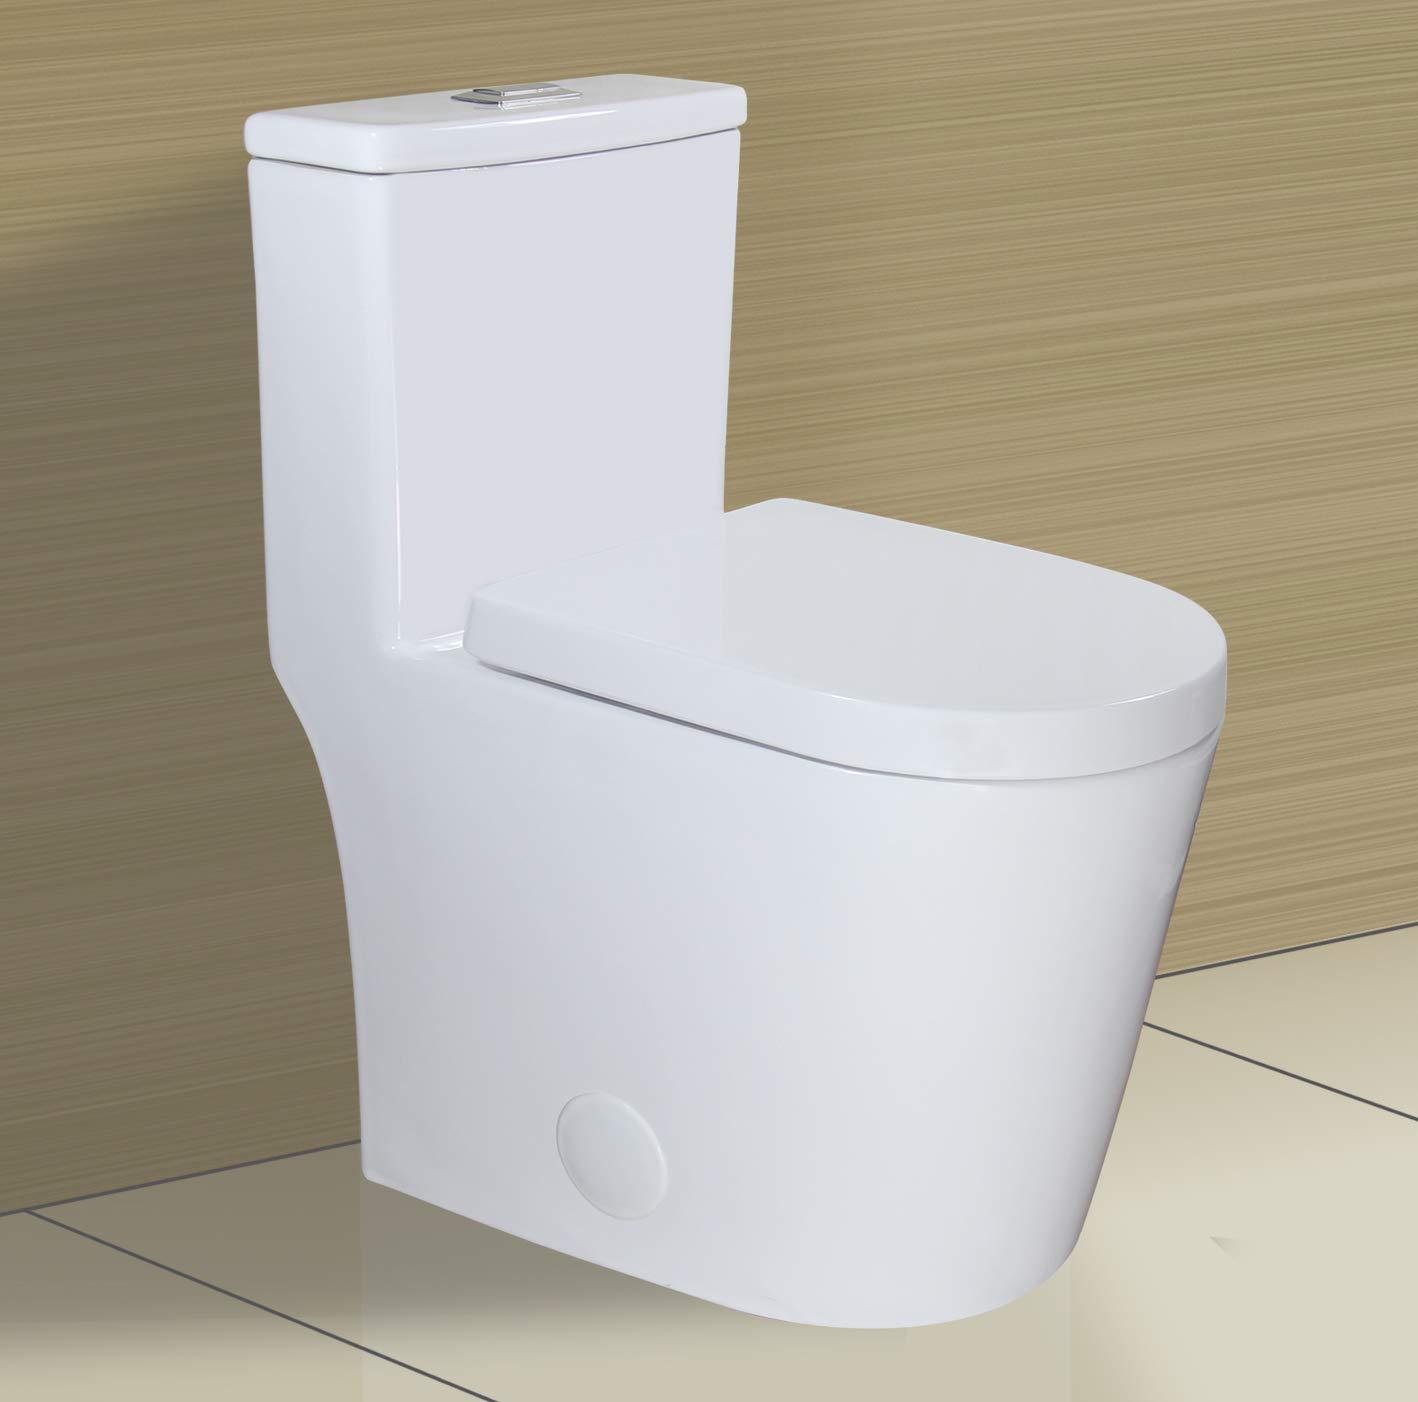 "WinZo WZ5089 Short Compact Round One Piece Toilet,Dual Flush Small Modern Bathroom Water Closet 12"" Rough-in White"